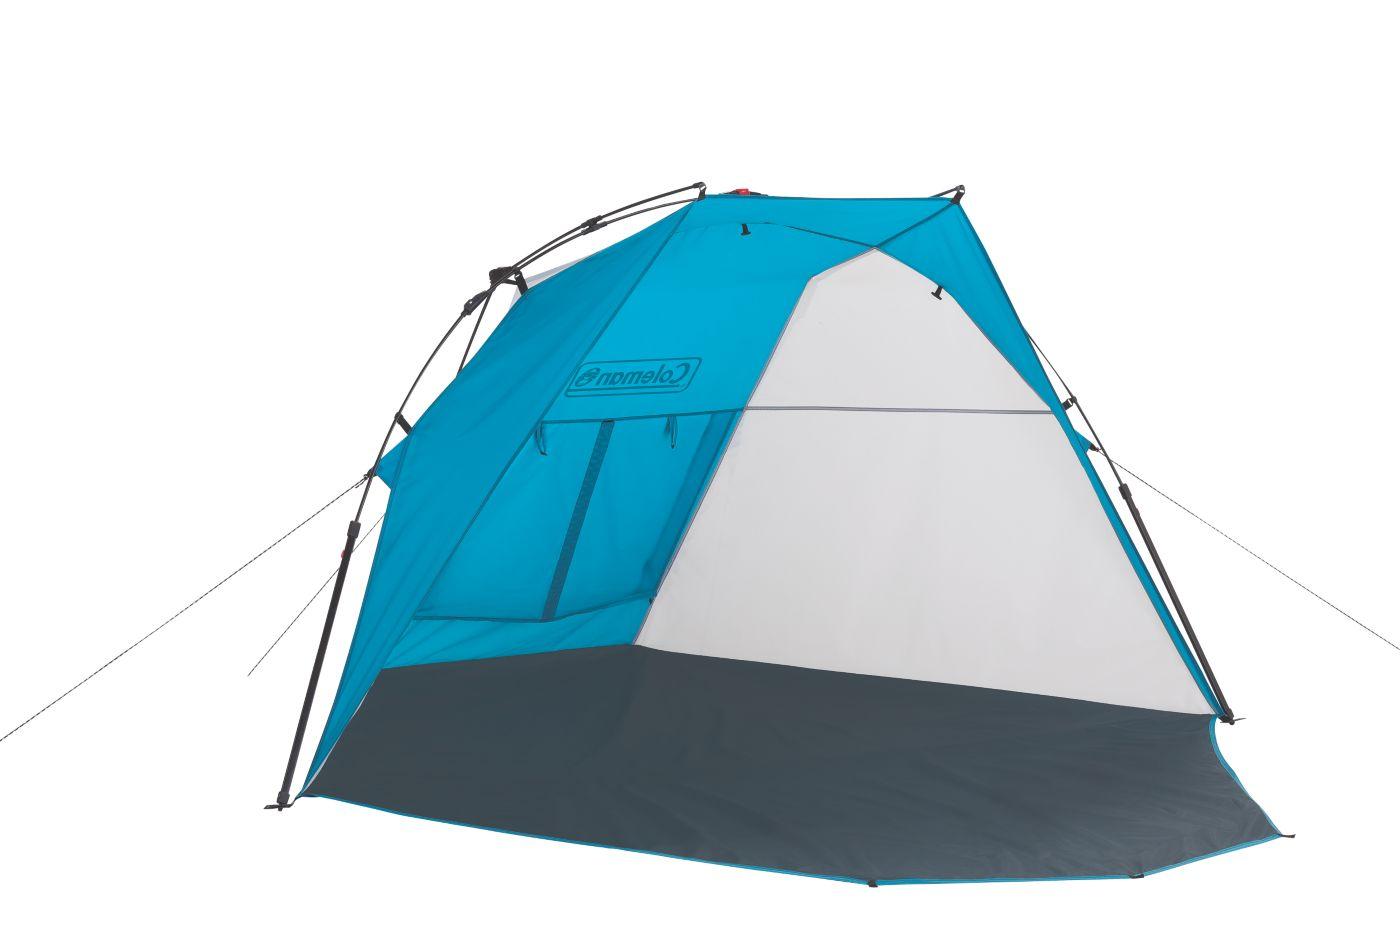 Custom pool enclosure hexagon shape Enclosure Kits Shoreline Instant Shade Pool Warehouse Instant Pop Up Canopy Tents Coleman